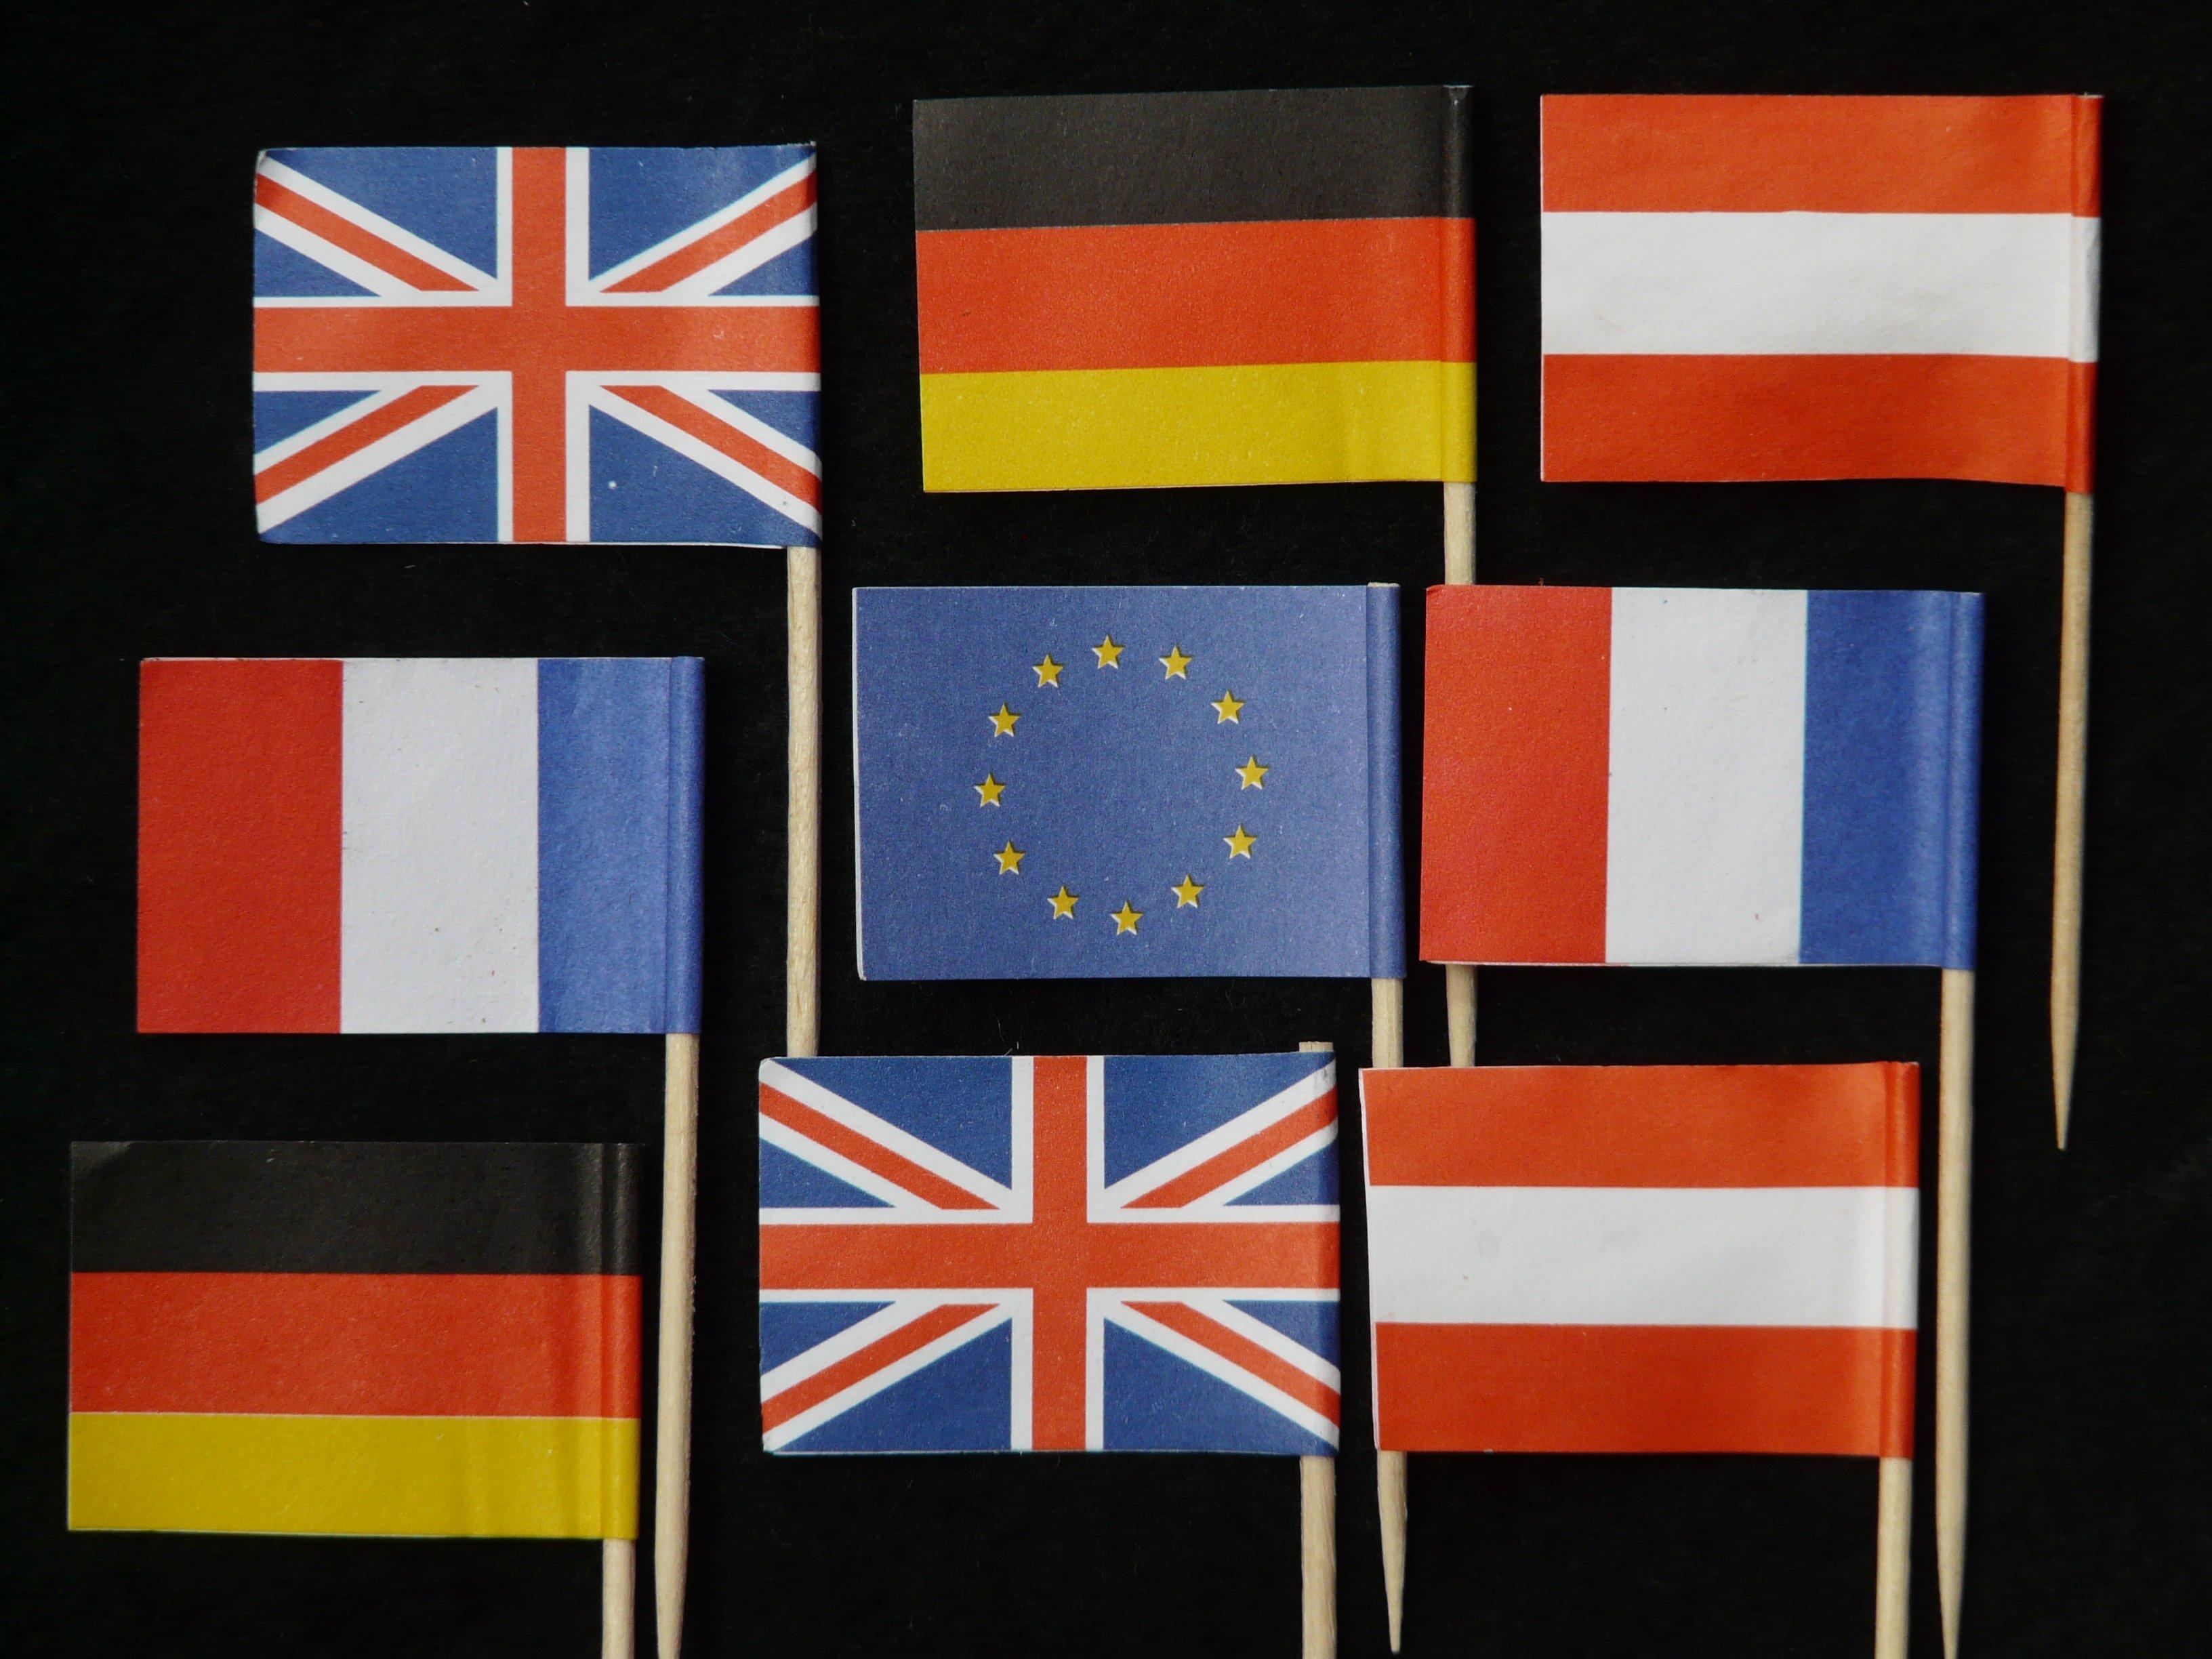 Fotos gratis : país, Francia, Europa, línea, color, bandera, vistoso ...